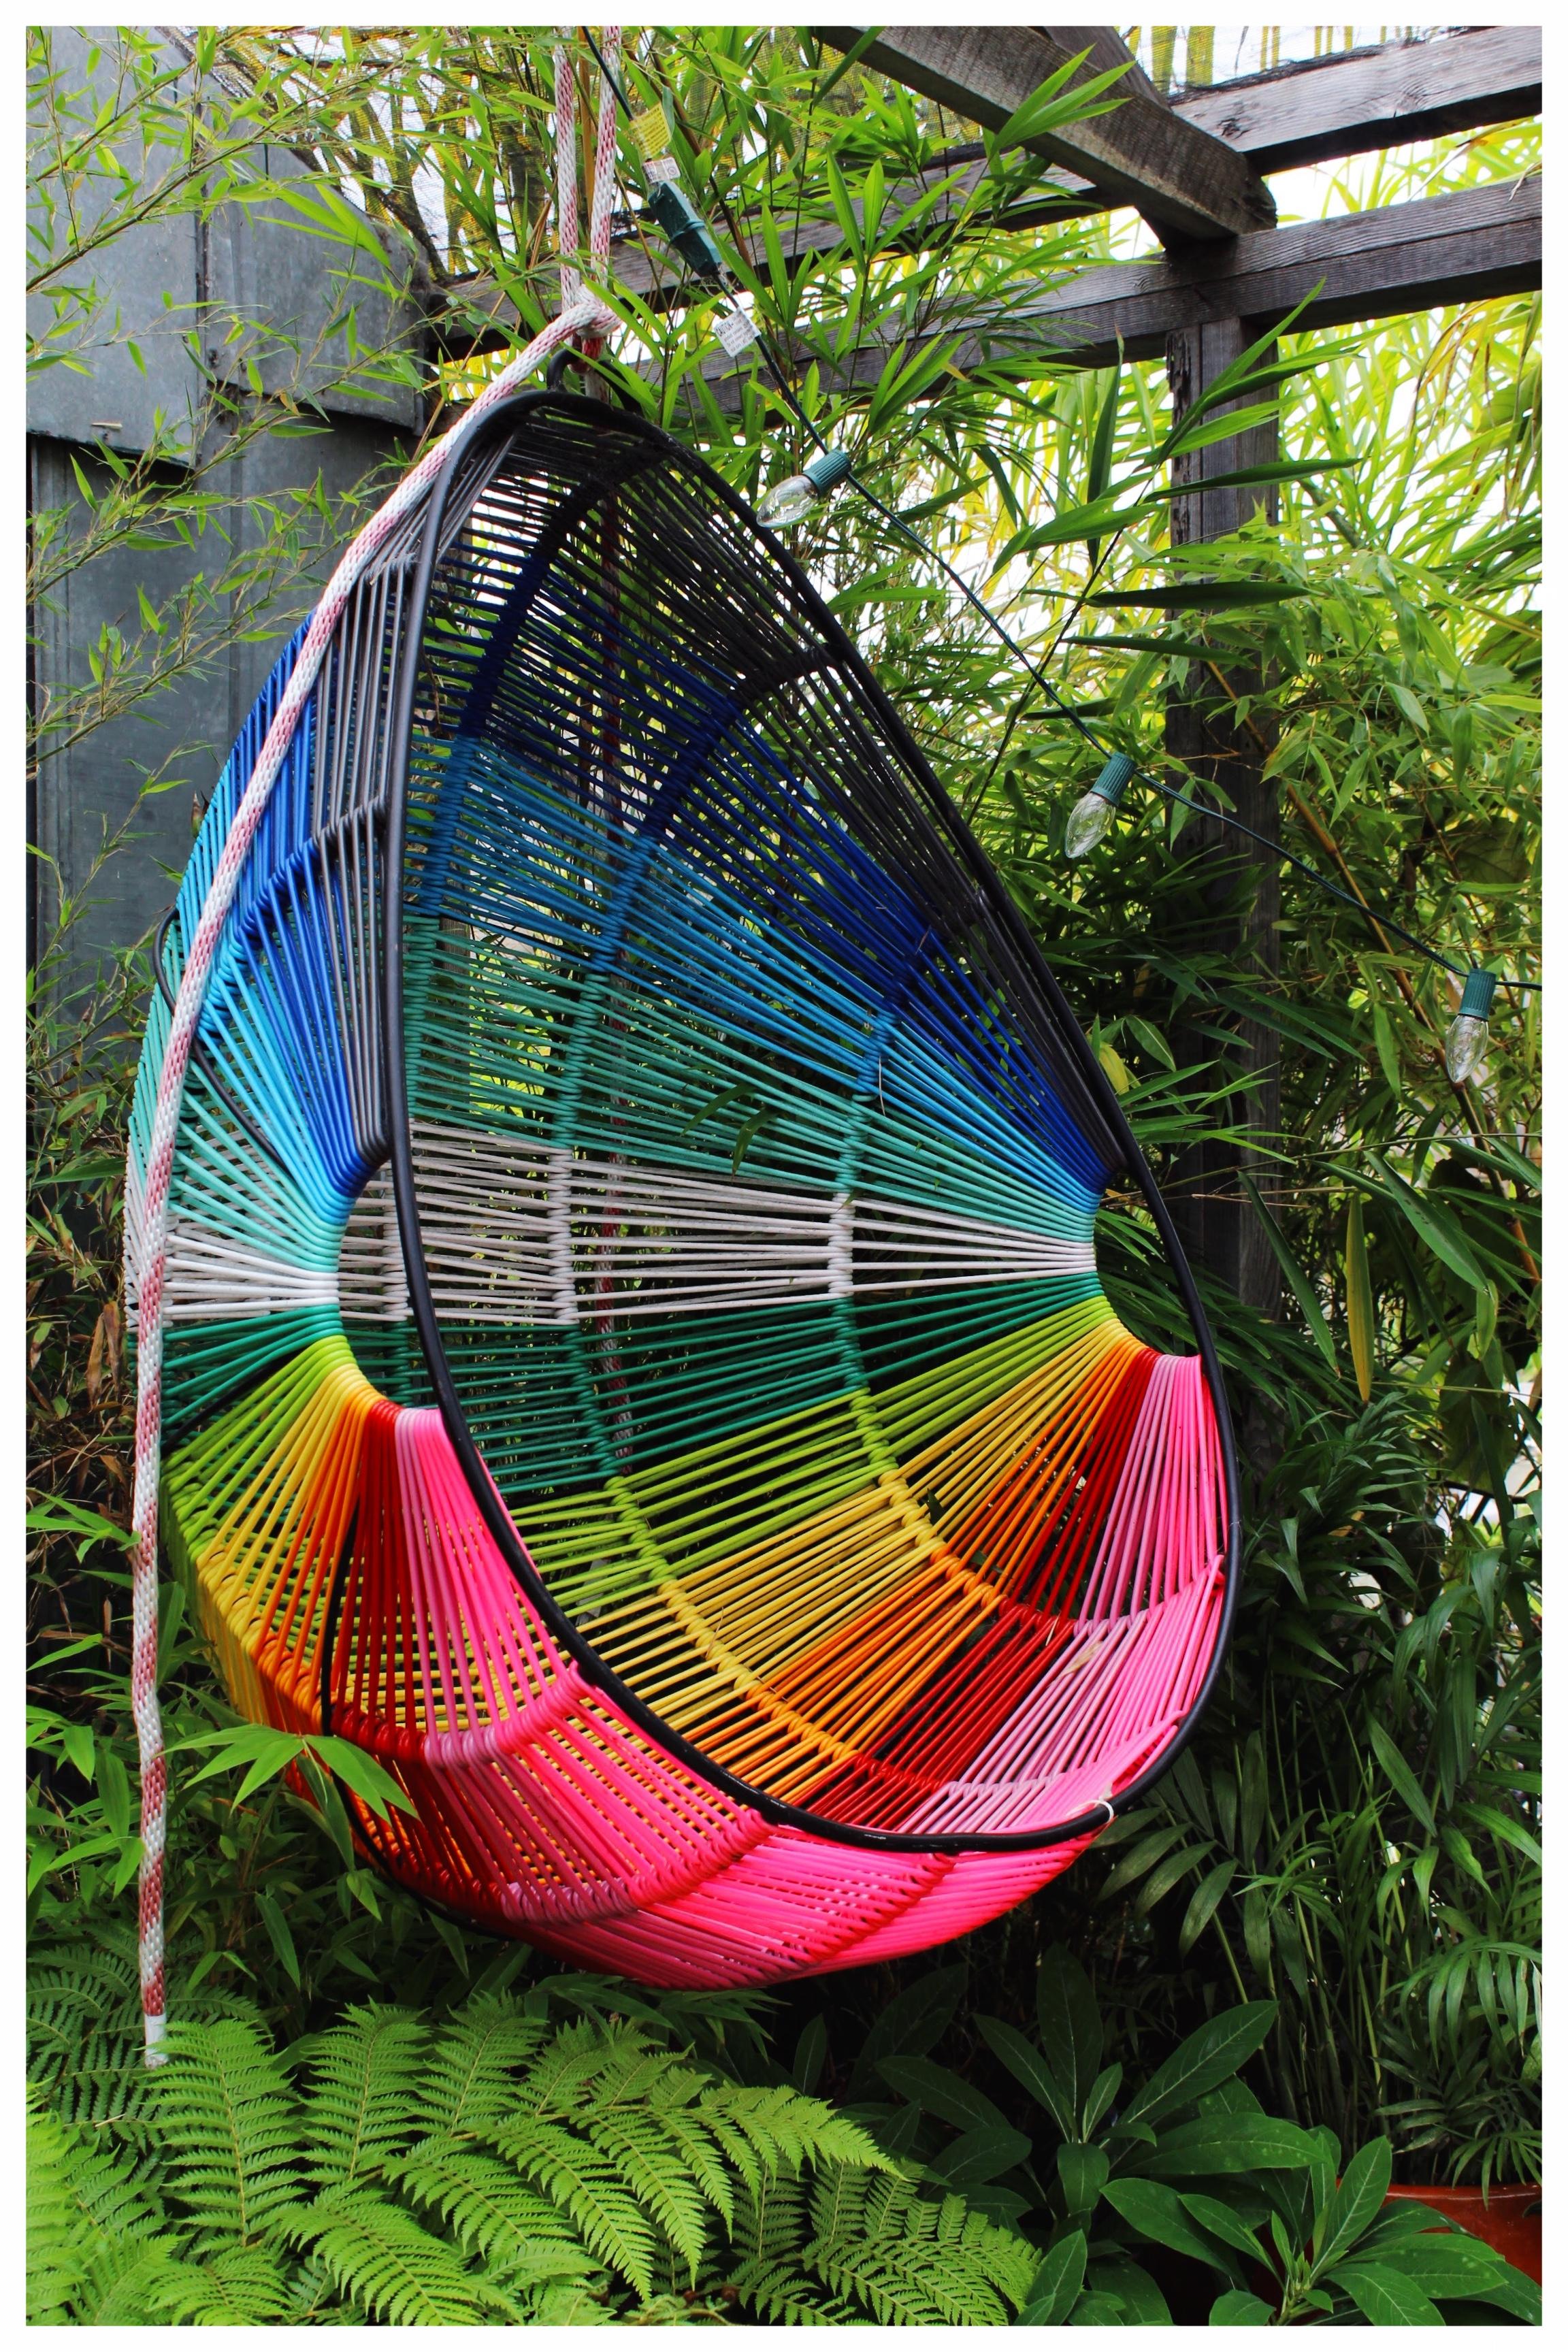 Woven Hanging Rainbow Chair